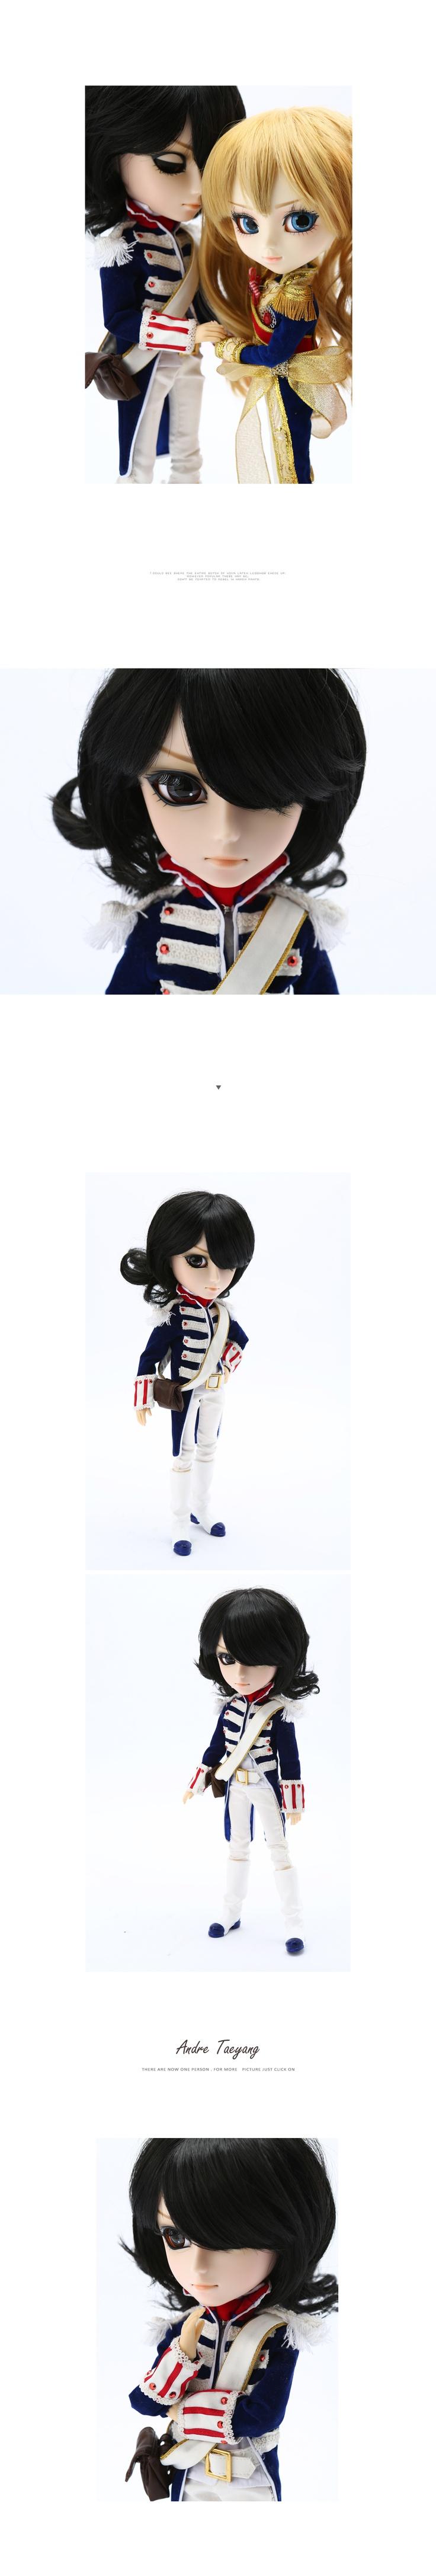 Pullip Andre Grandier doll